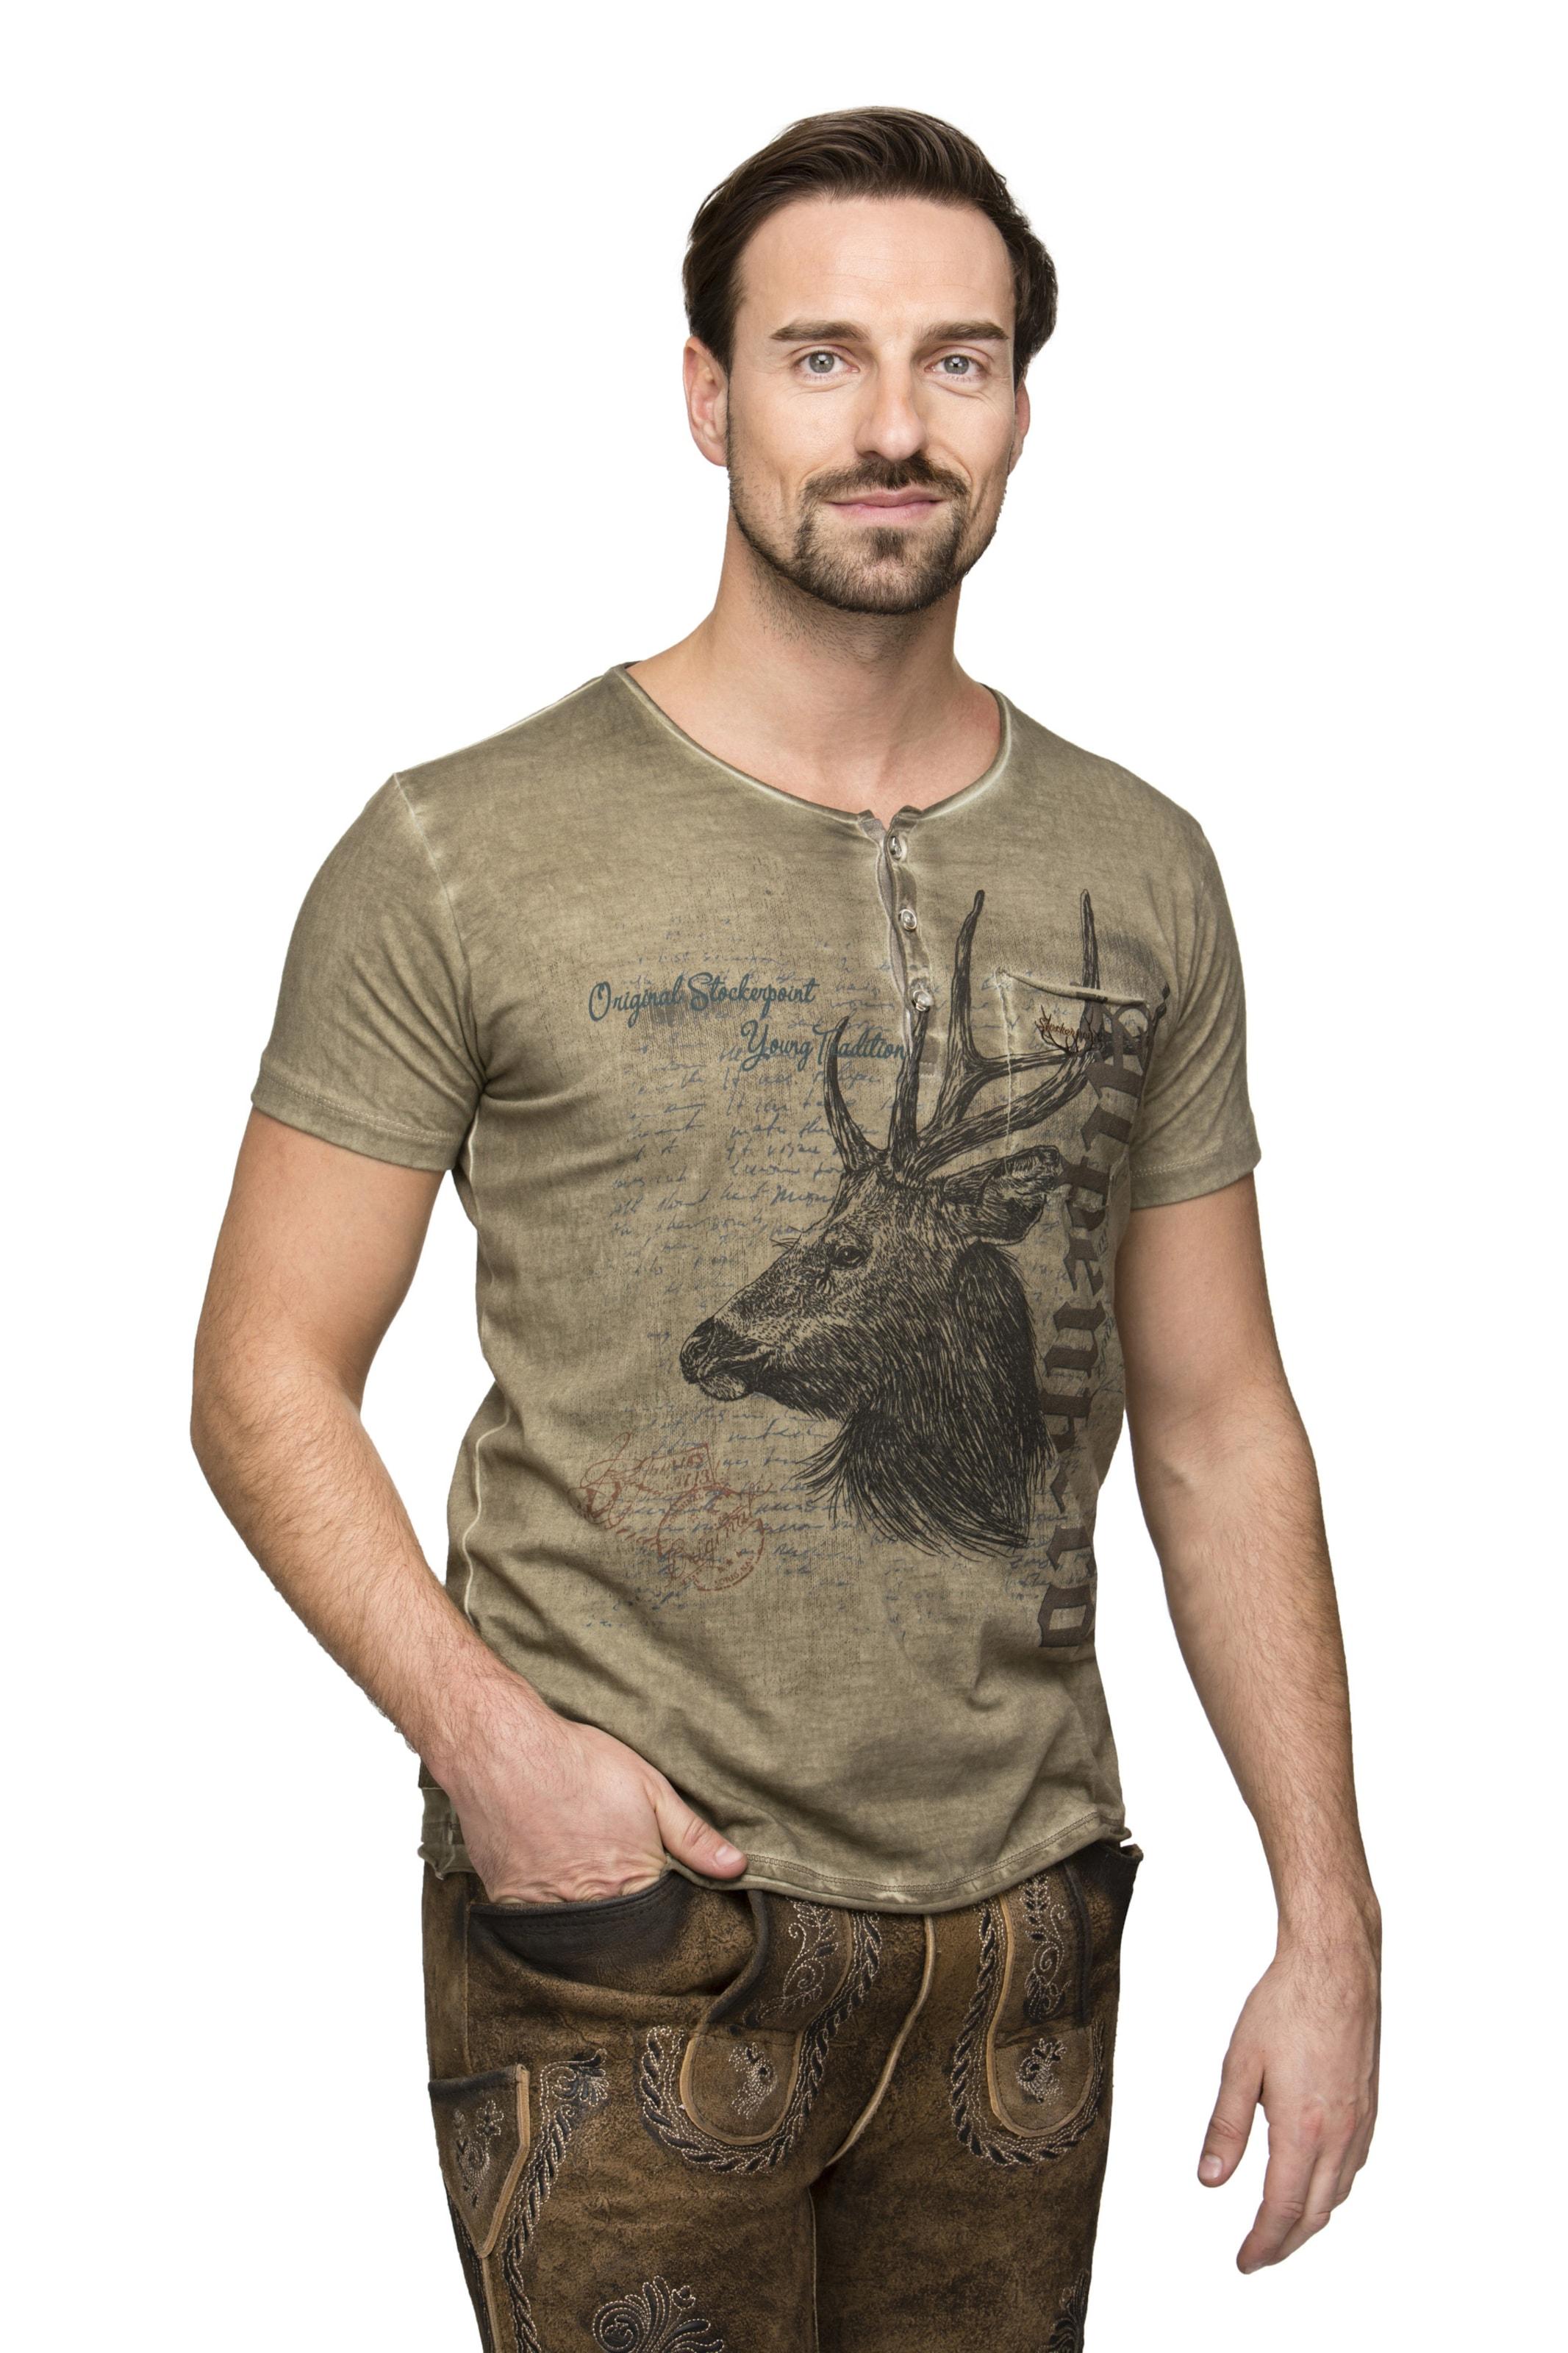 STOCKERPOINT Shirt South Fälschung Günstig Online Bester Verkauf Günstiger Preis 75eGudee